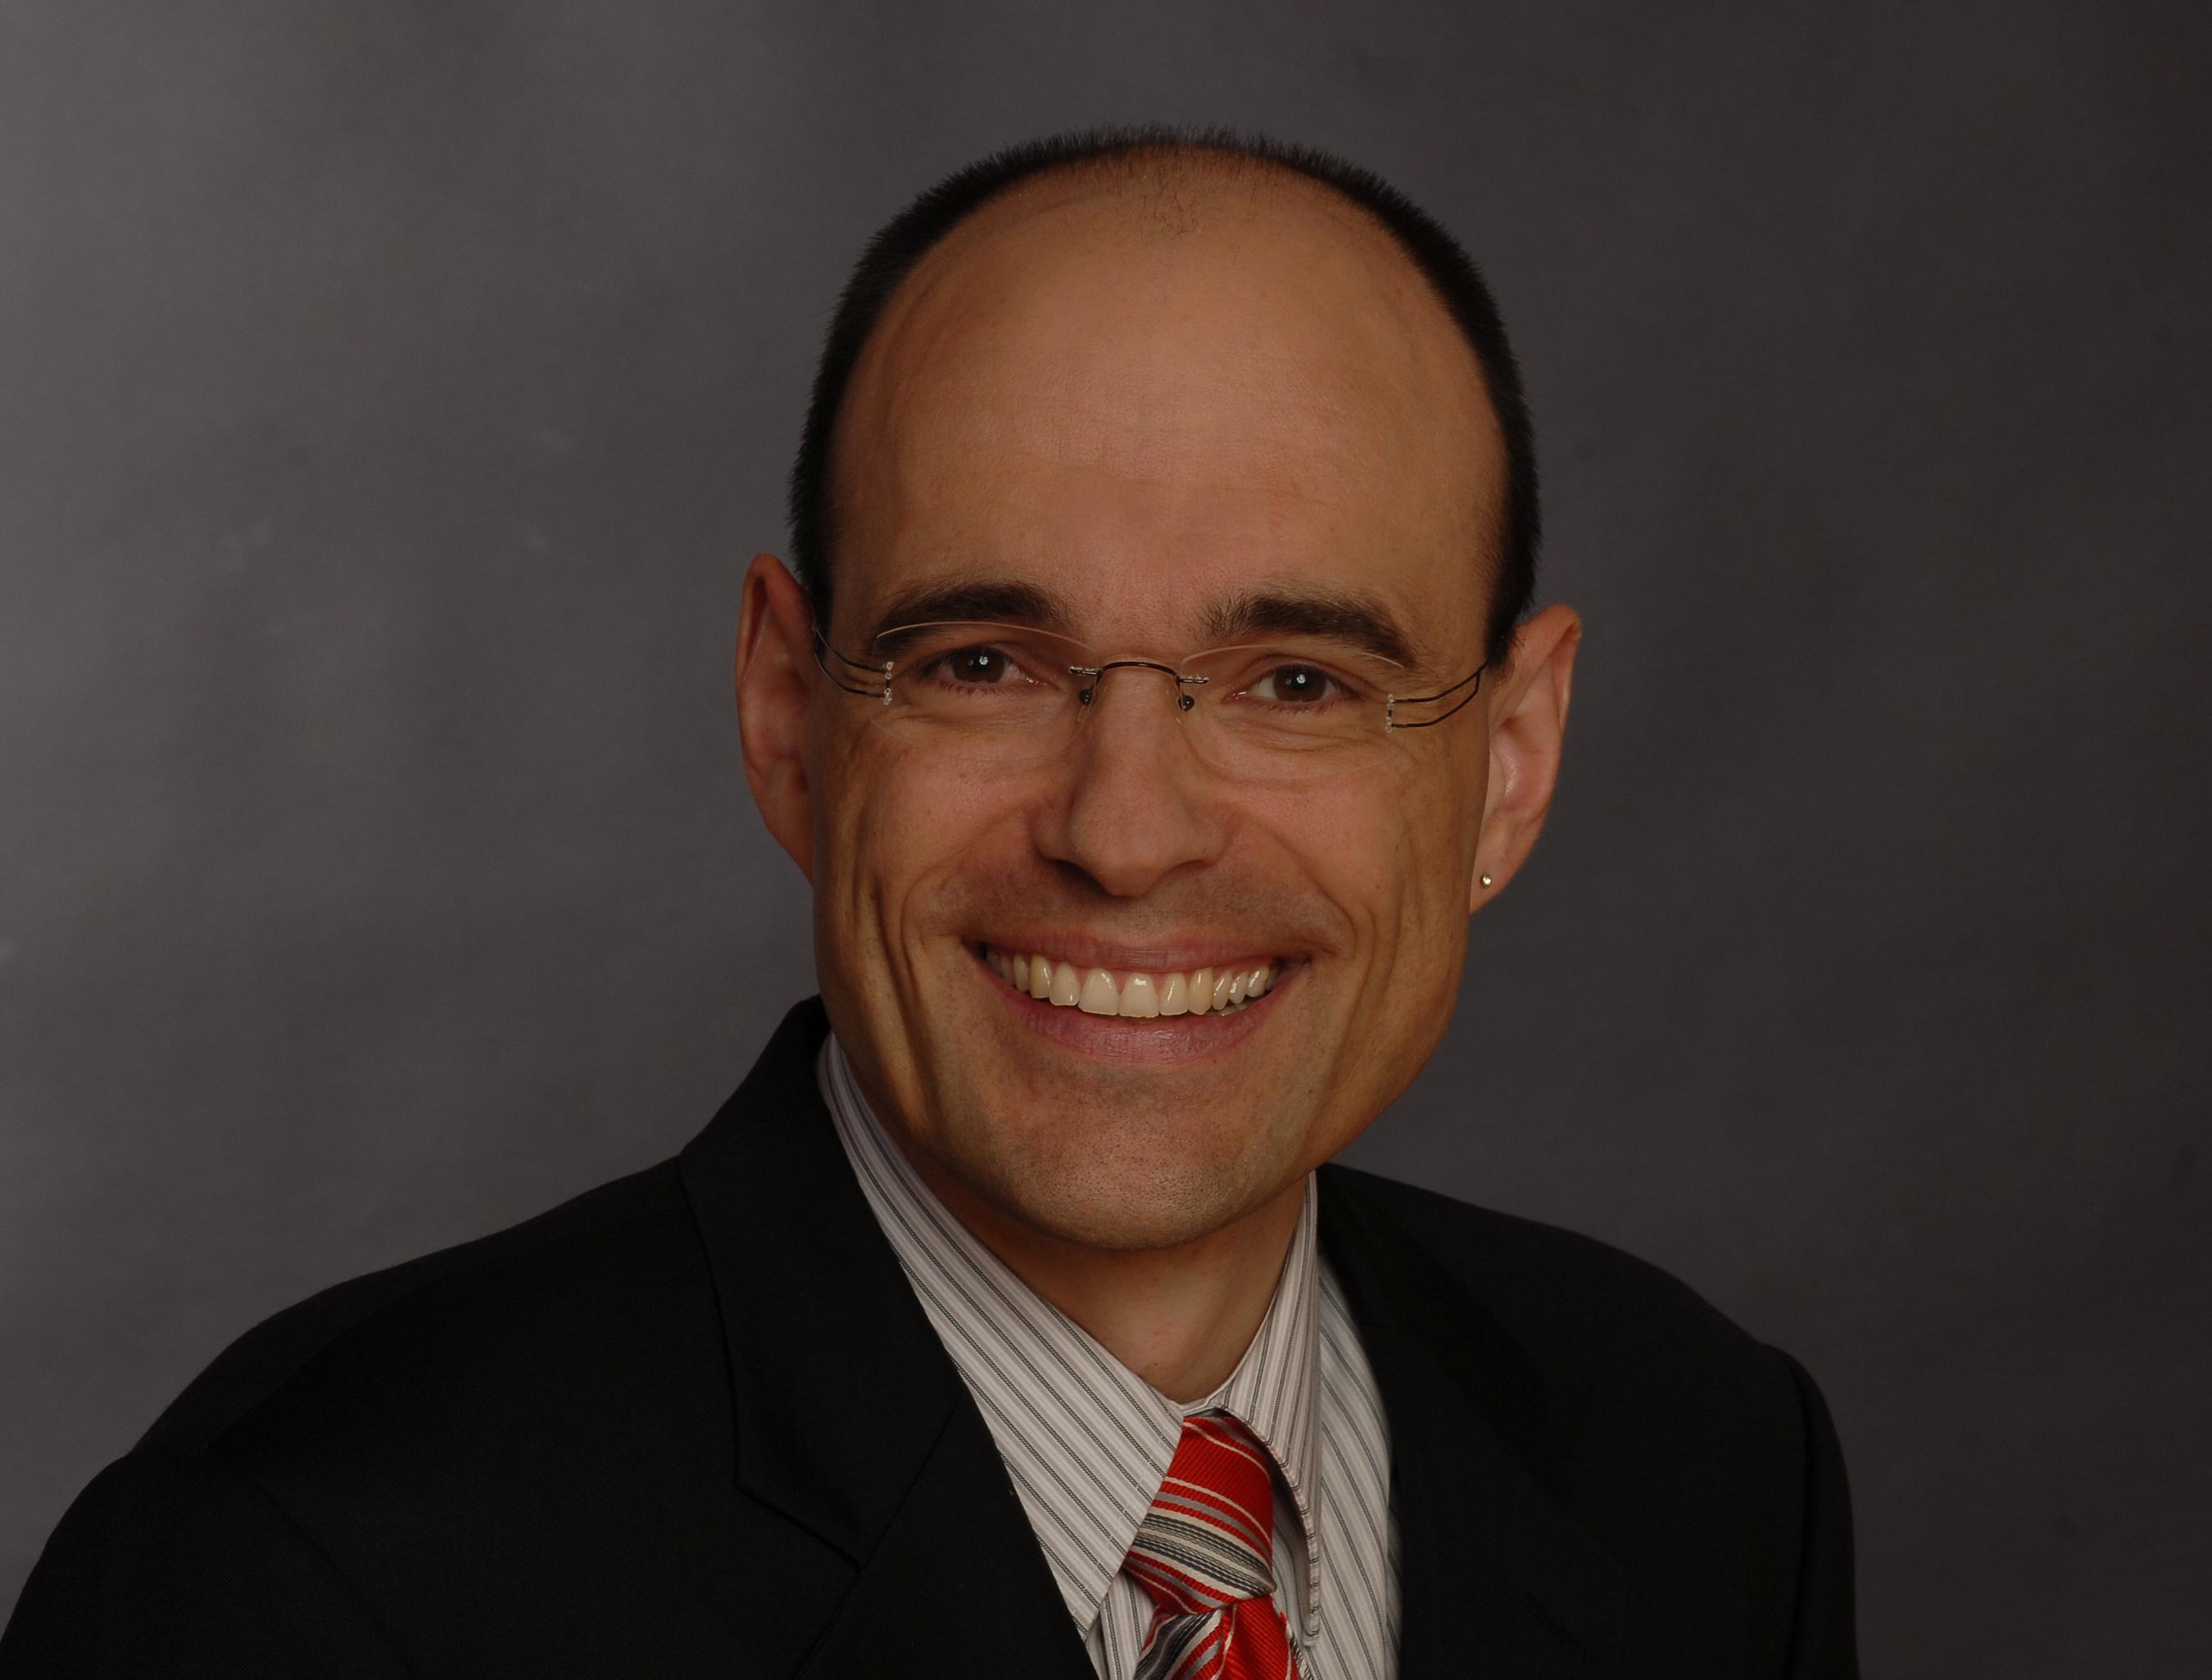 Dr. Christian Krey, CEO, EMPERRA(R) GmbH E-Health Technologies (PRNewsFoto/Business Worldwide Magazine)